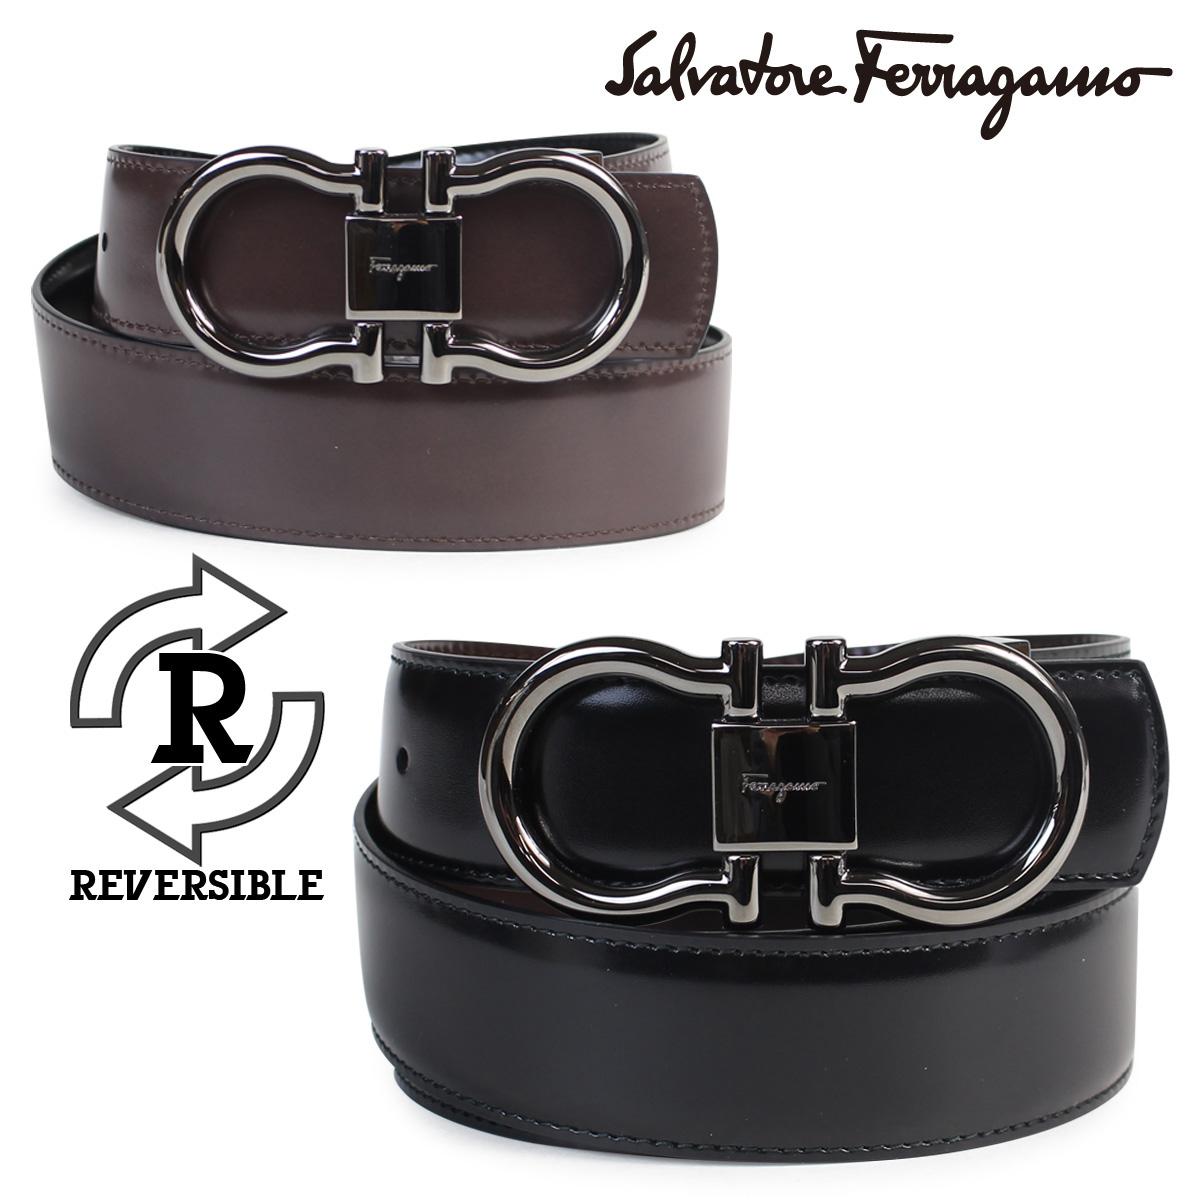 bd3256562cf99 Salvatore Ferragamo belt men genuine leather reversible Salvatore Ferragamo  business wedding ceremony ...